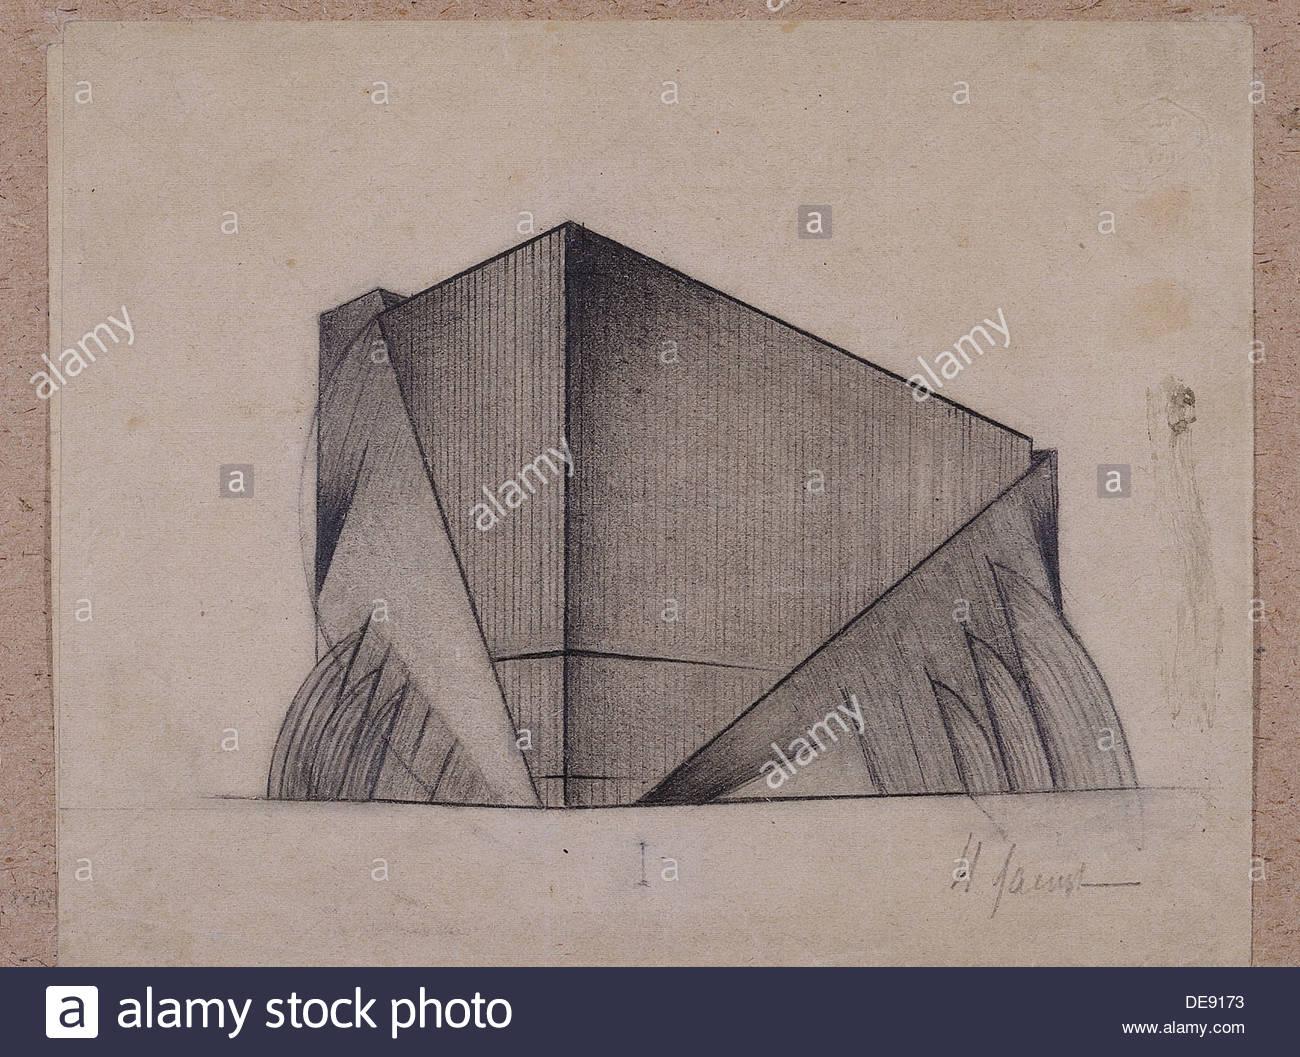 Parallelepiped, 1921. Artist: Lamtsov, Ivan Vasilyevich (1899-1990) - Stock Image